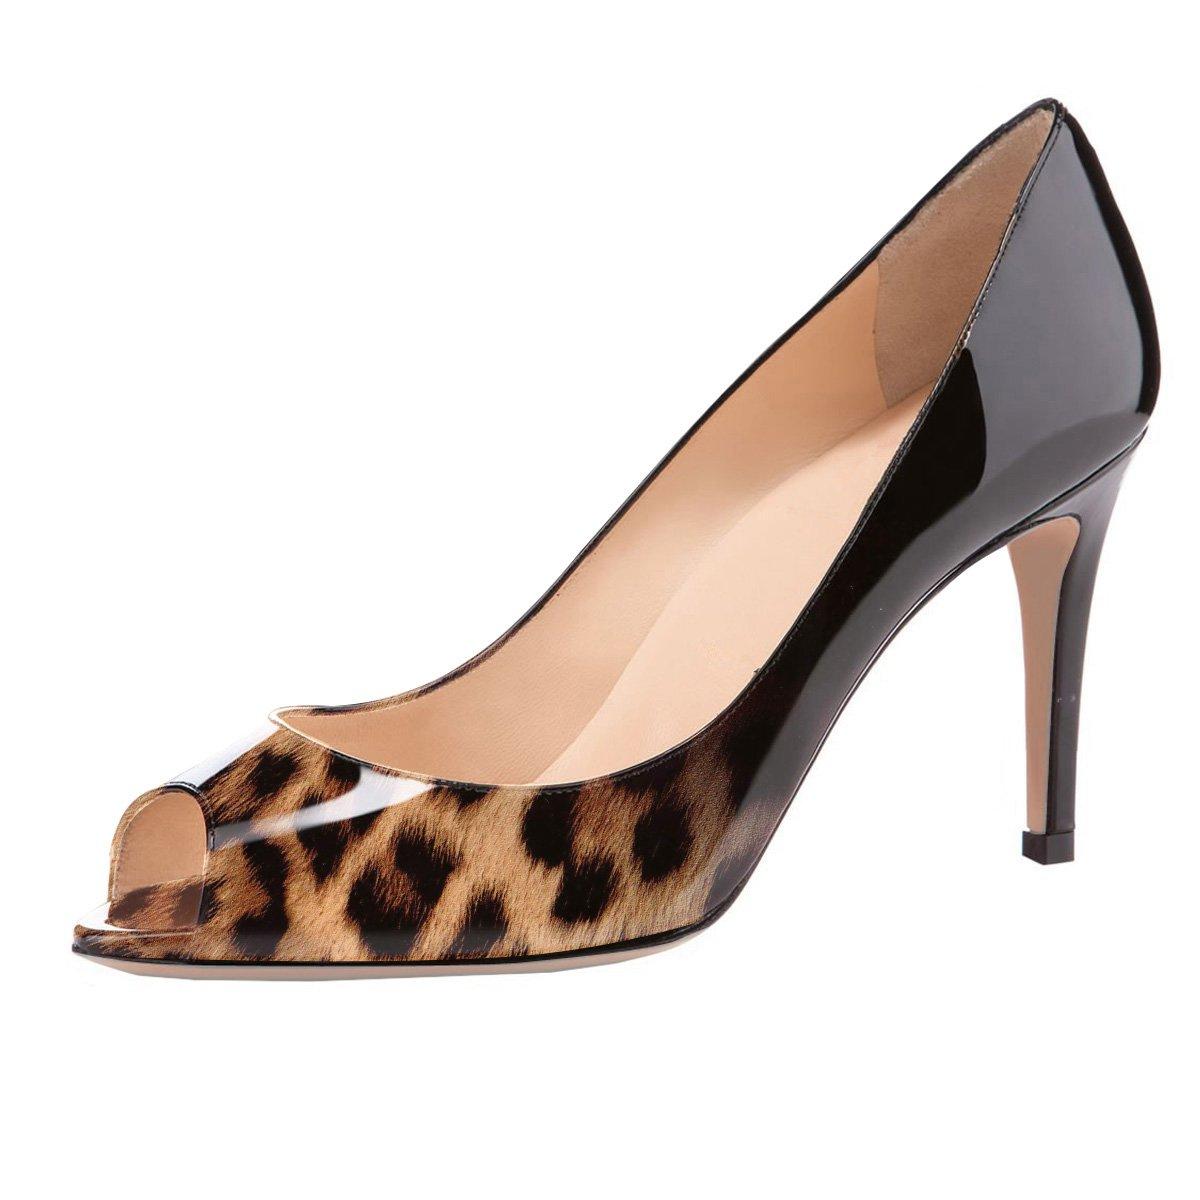 Eldof Women Peep Toe Pumps Mid-Heel Pumps Formal Wedding Bridal Classic Heel Open Toe Stiletto B07FH7S5YY 8 B(M) US|Black-leopard